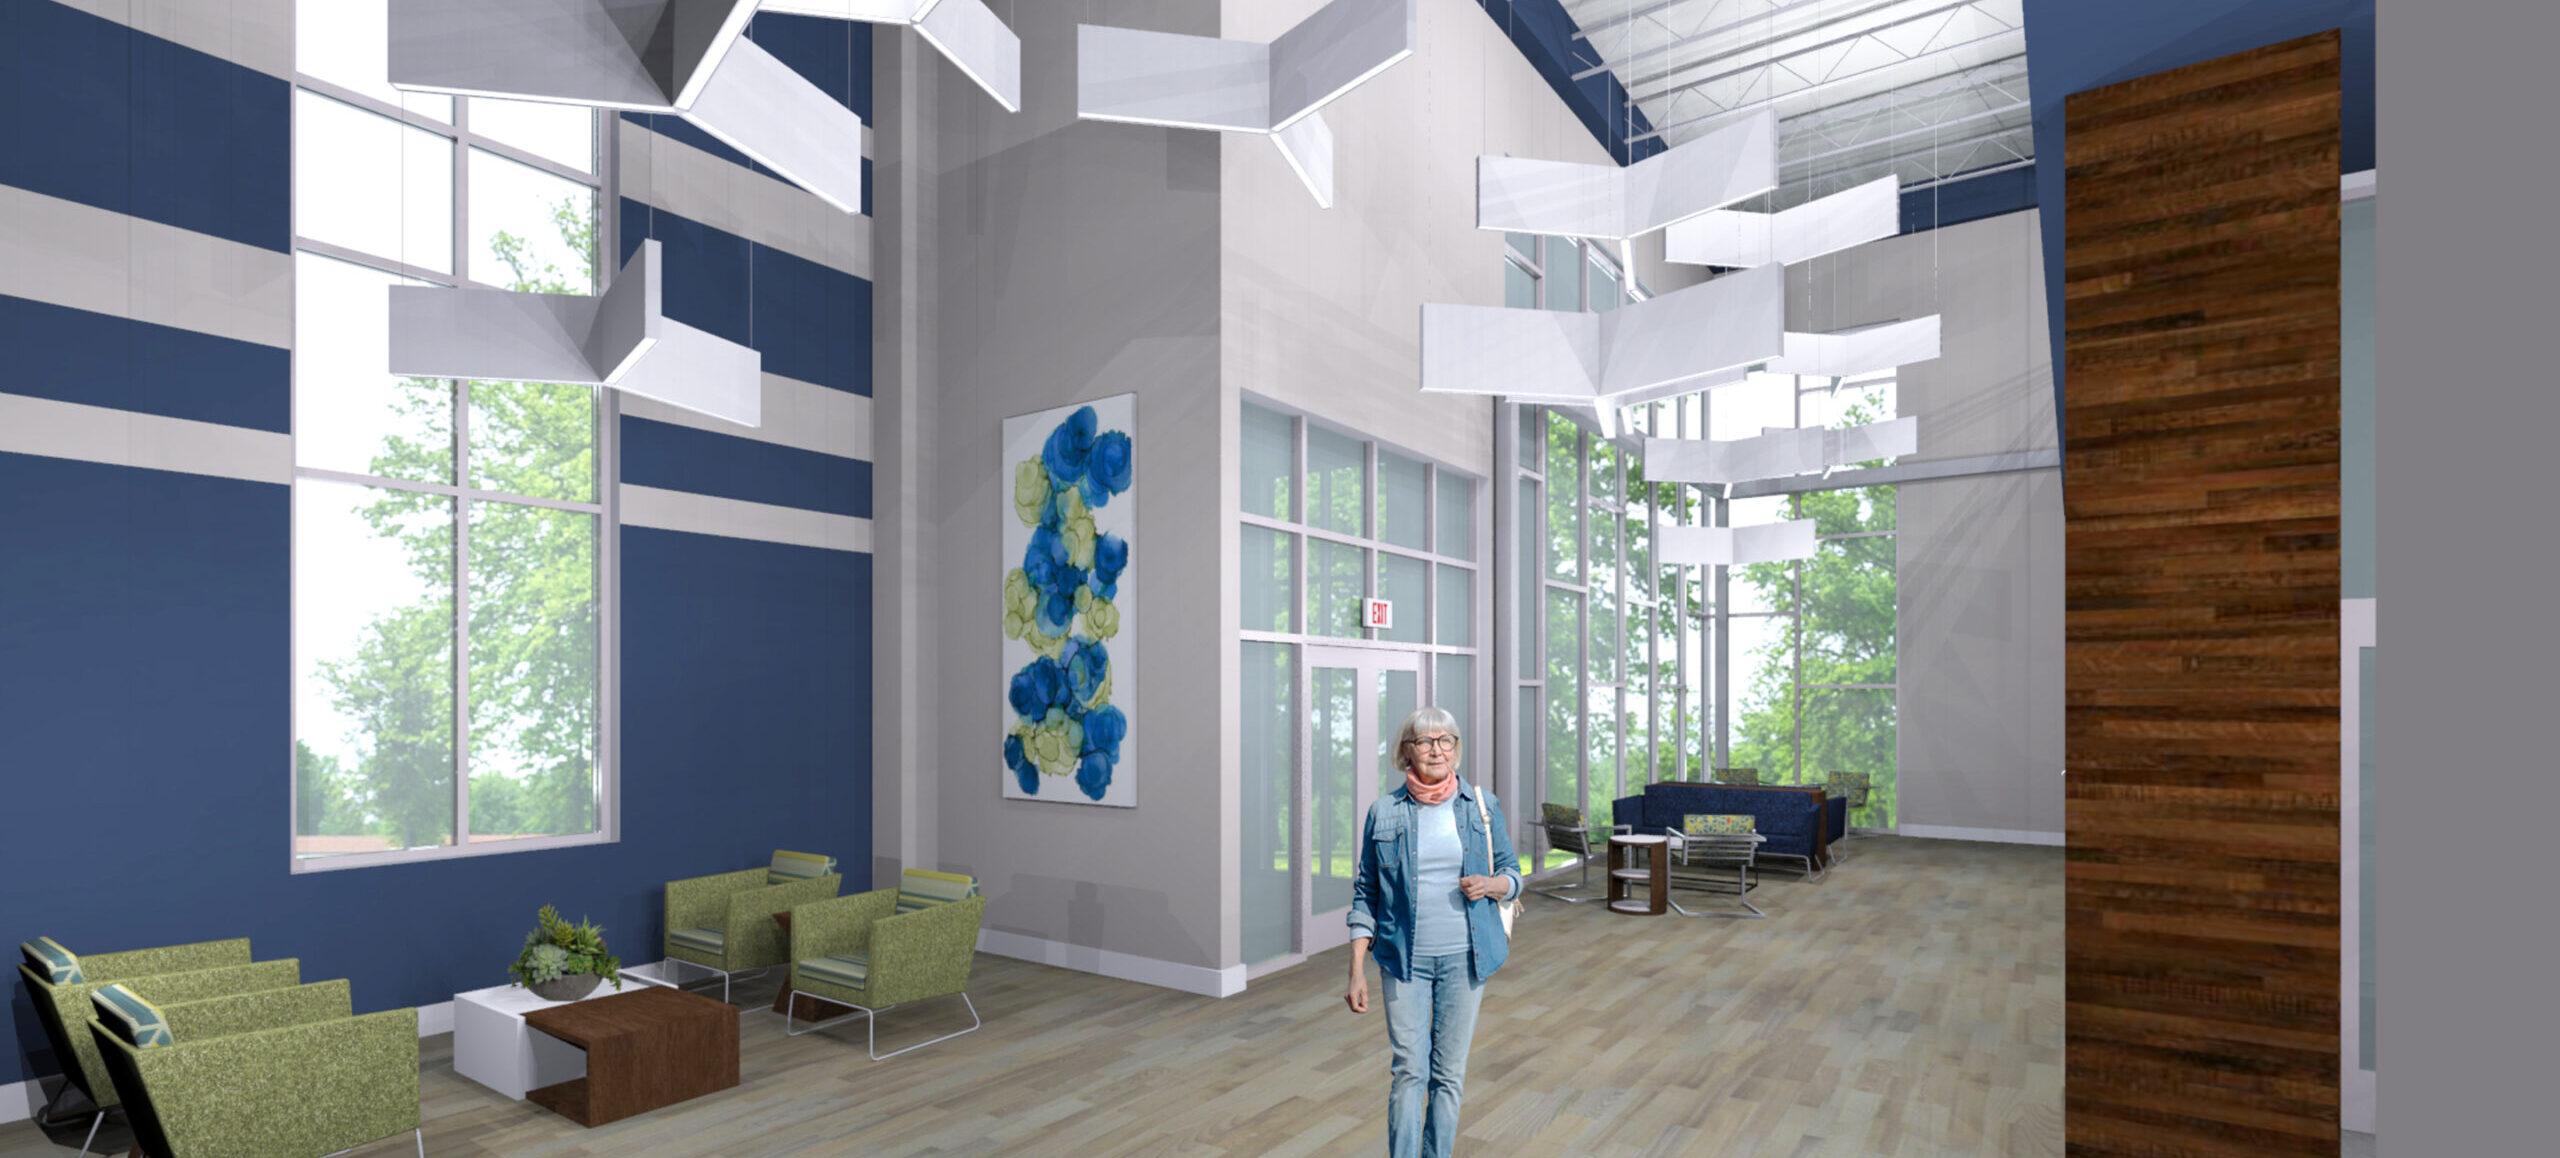 Glenaire Wellness Center Entry